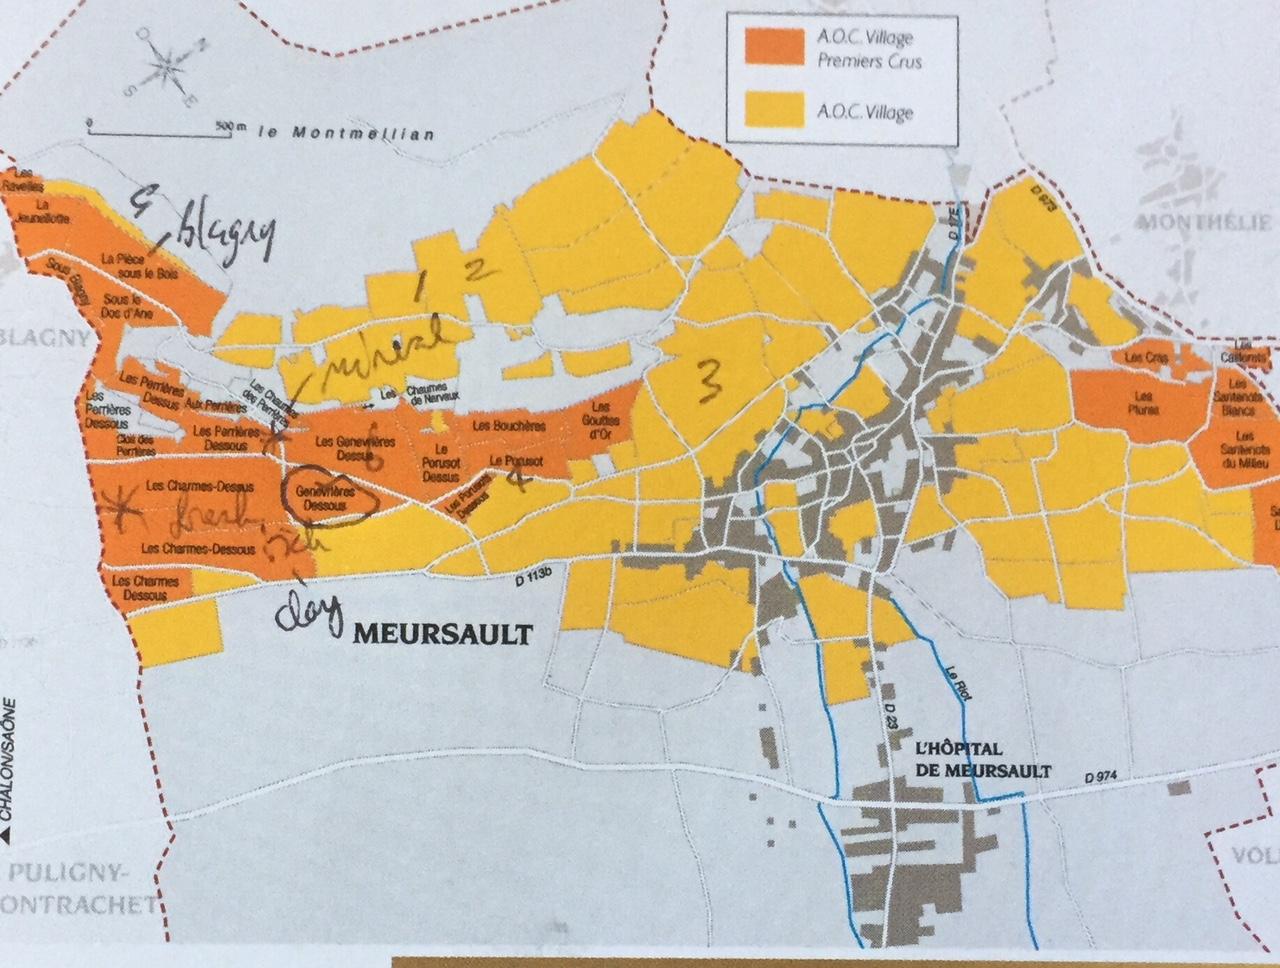 meursault-map.jpg